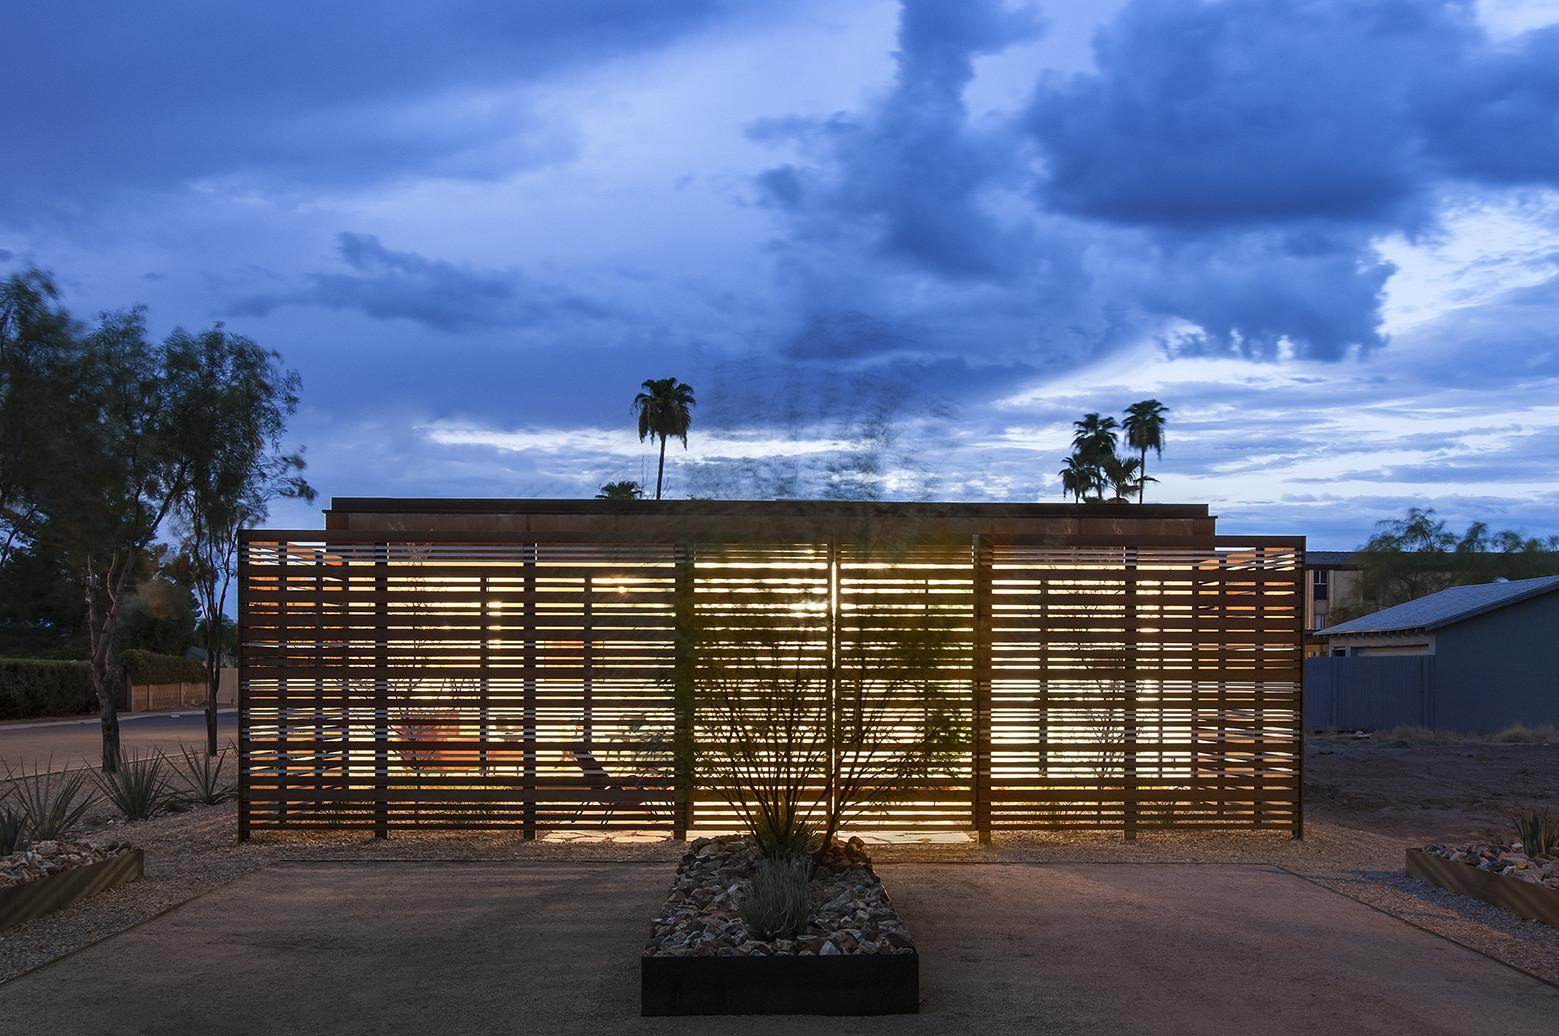 Protótipo Vali Homes / colab studio + 180 degrees design , © Mark Bosclaire